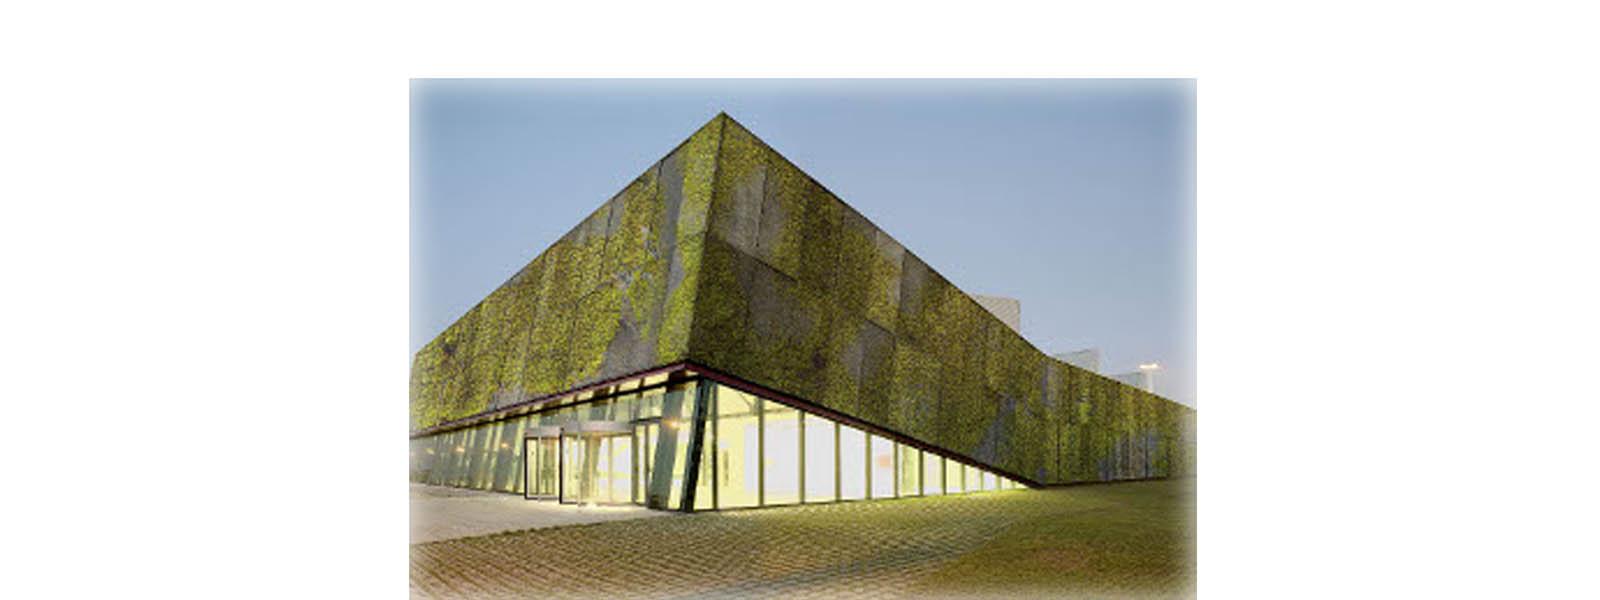 concreto-ecologico22